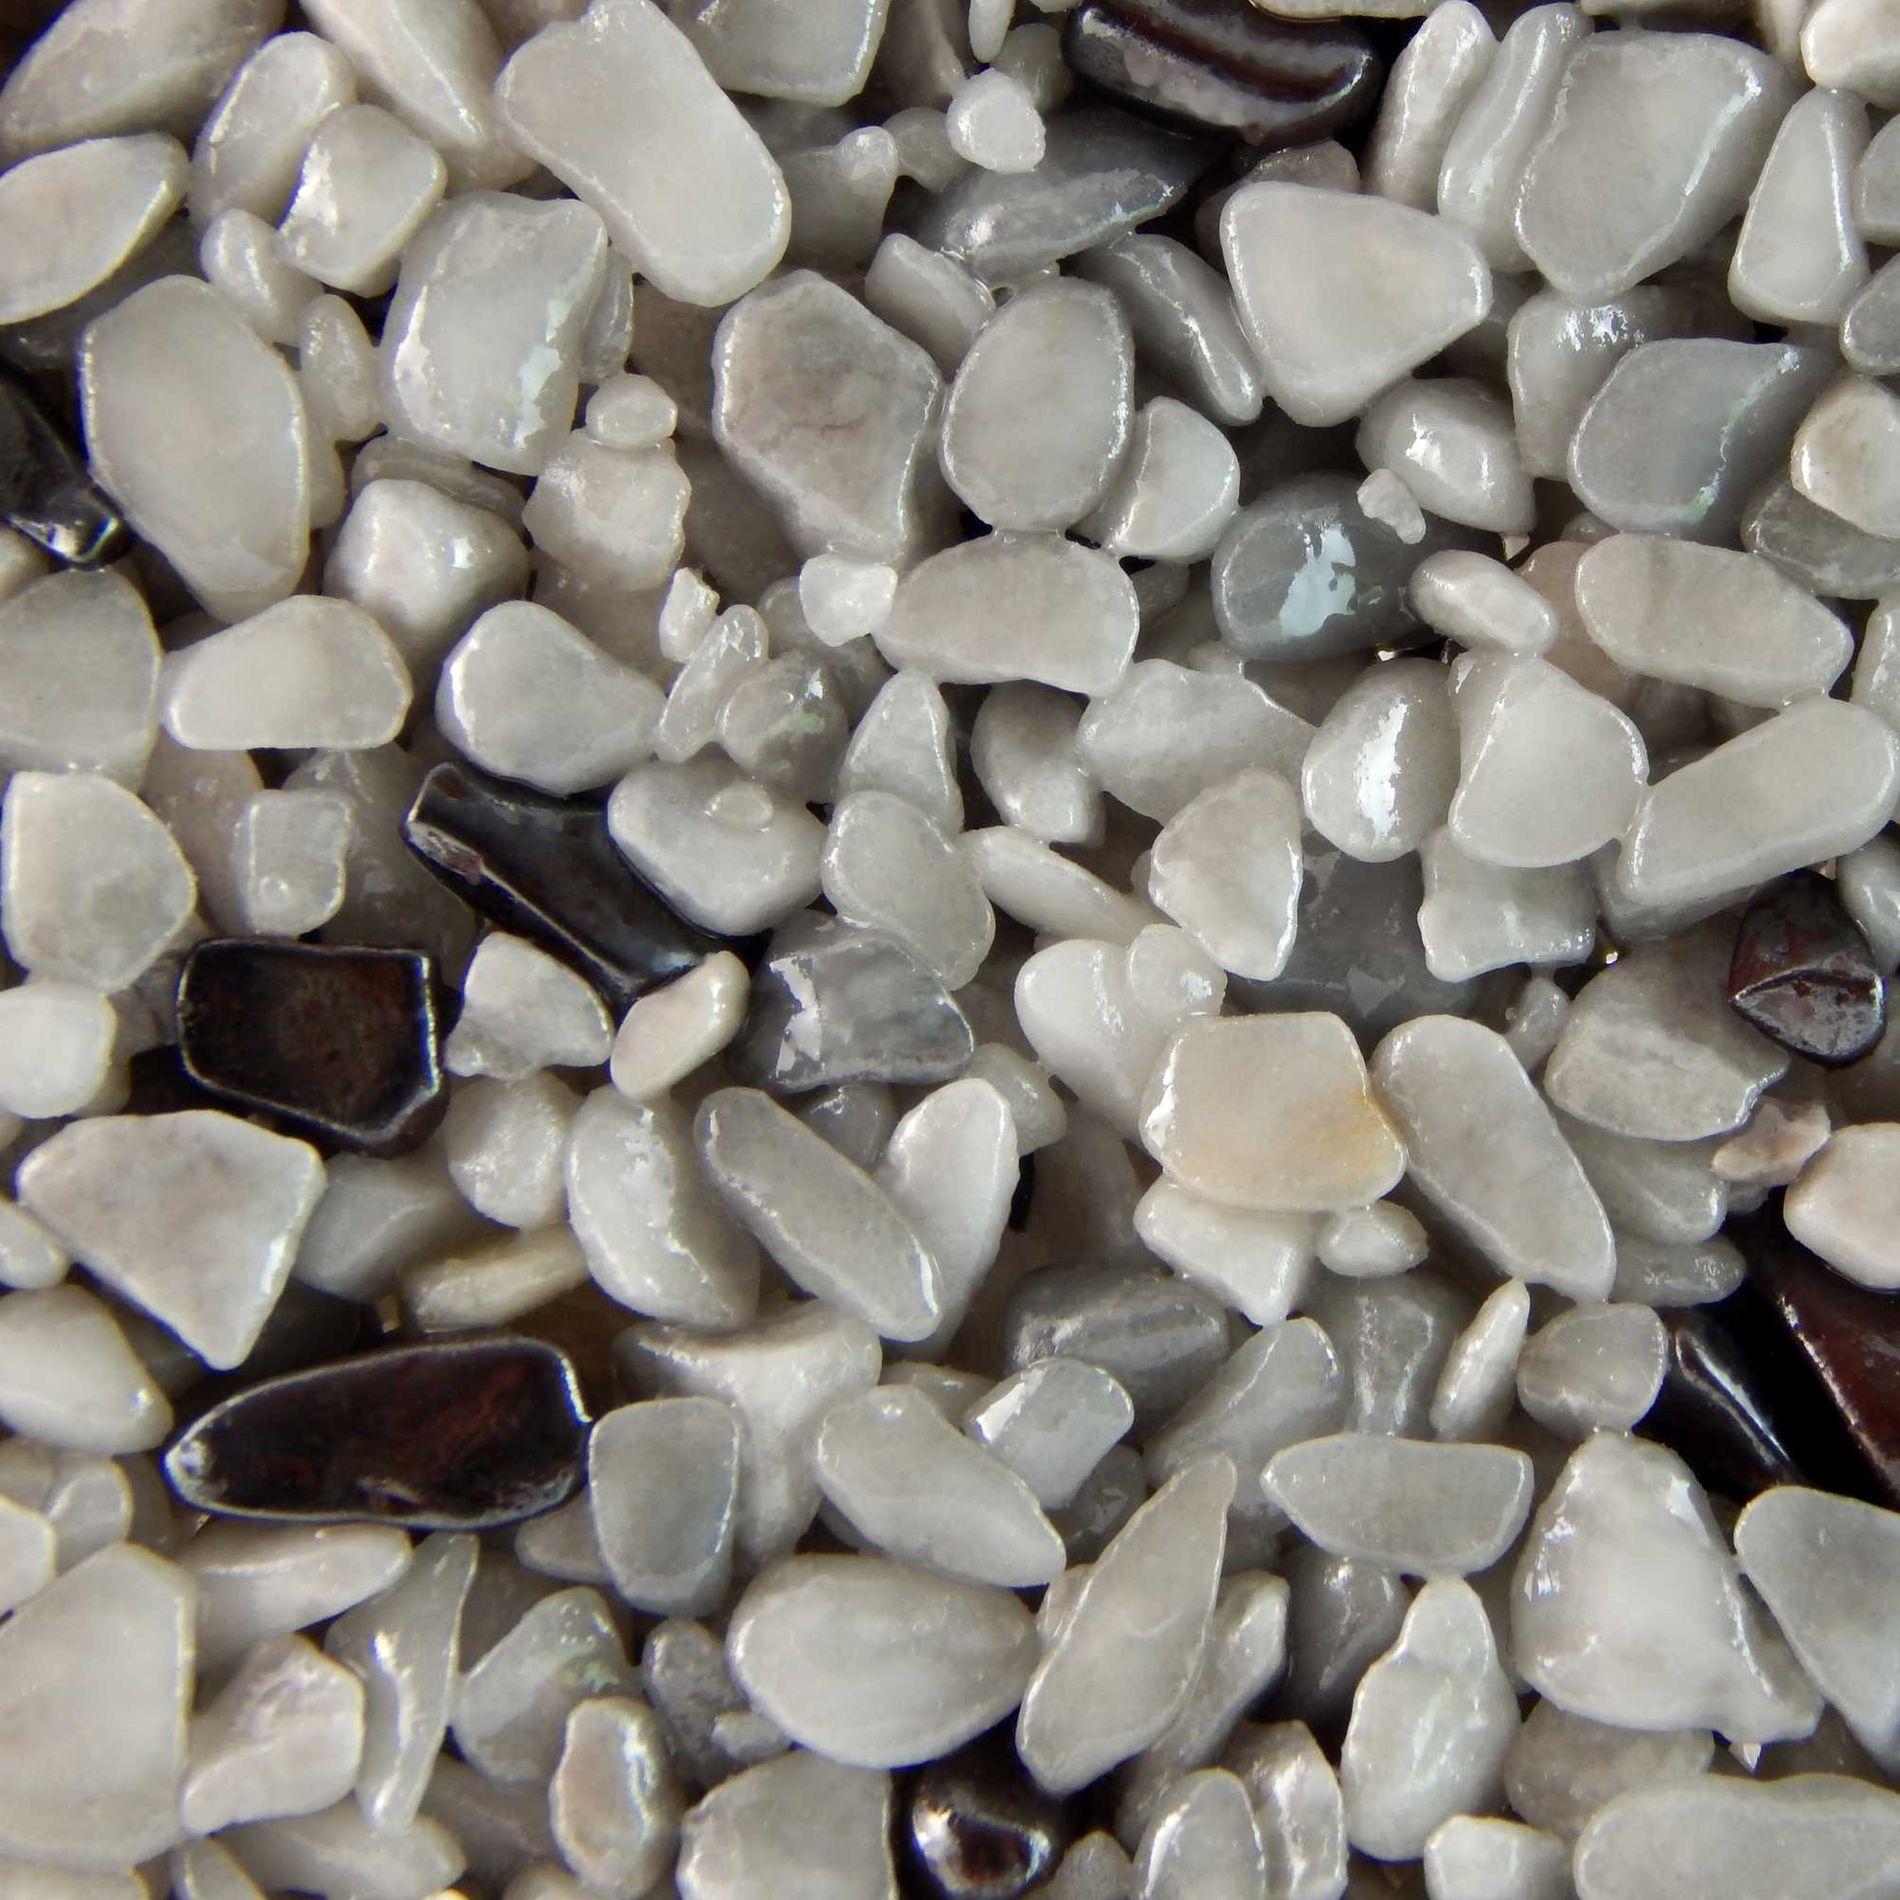 Terralith Edelsteinteppich Farbmuster - Hämatit / grau-